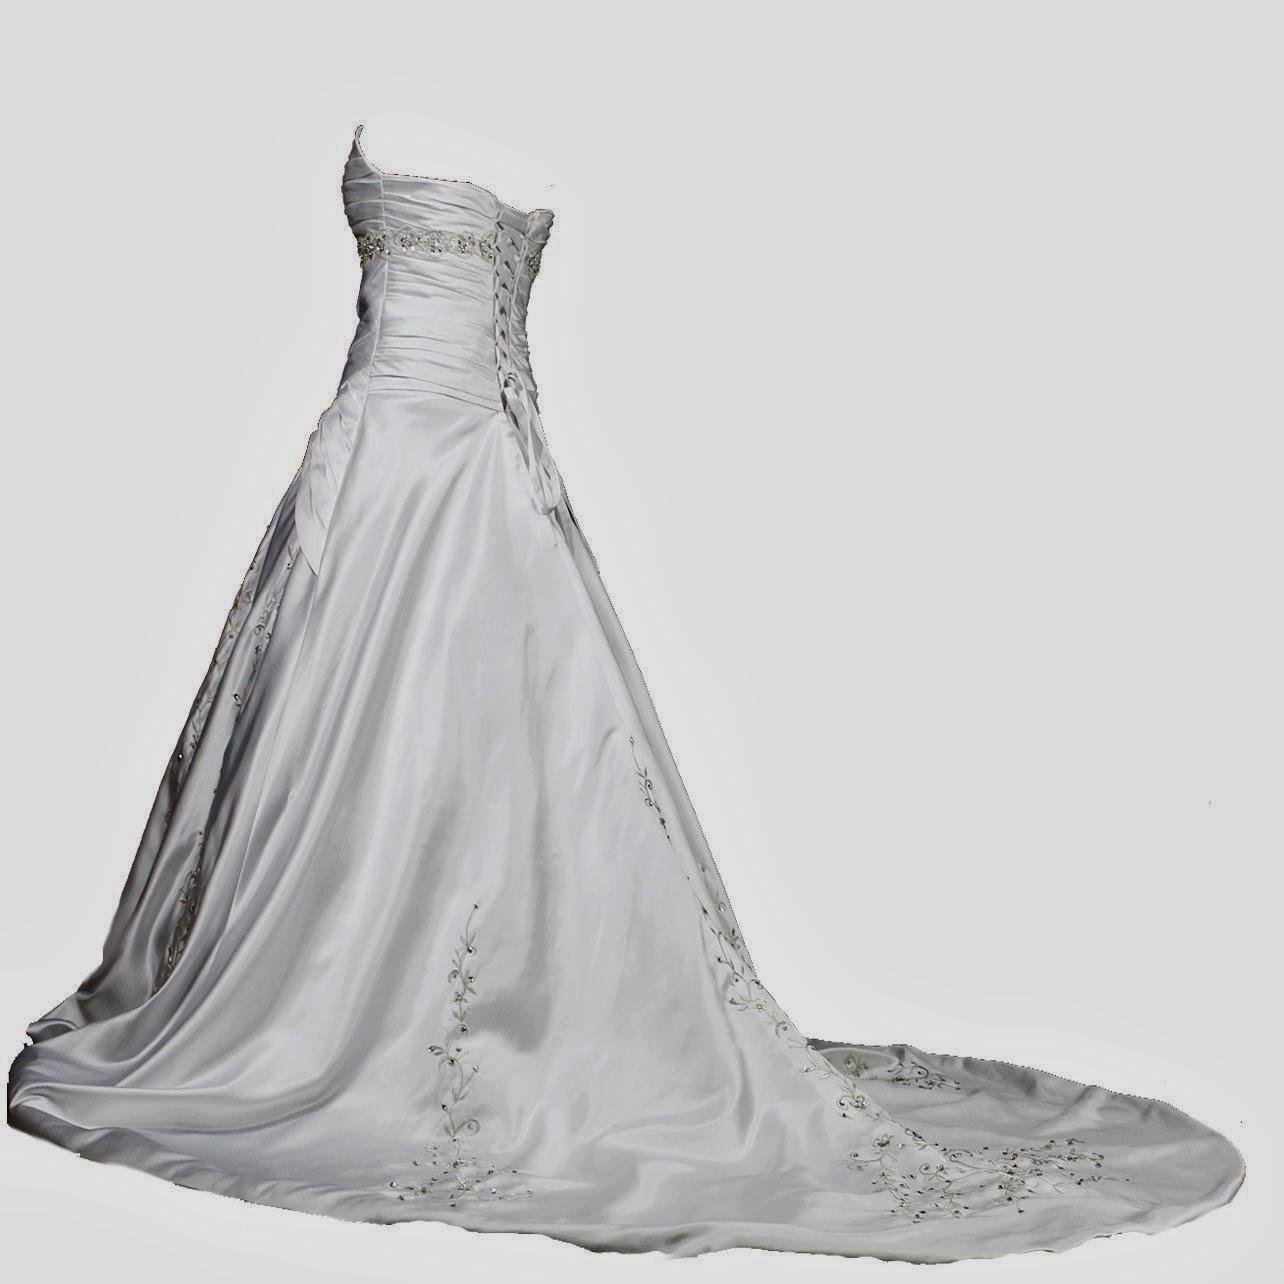 Faironly J5 White Ivory Sweetheart Wedding Dress Bride